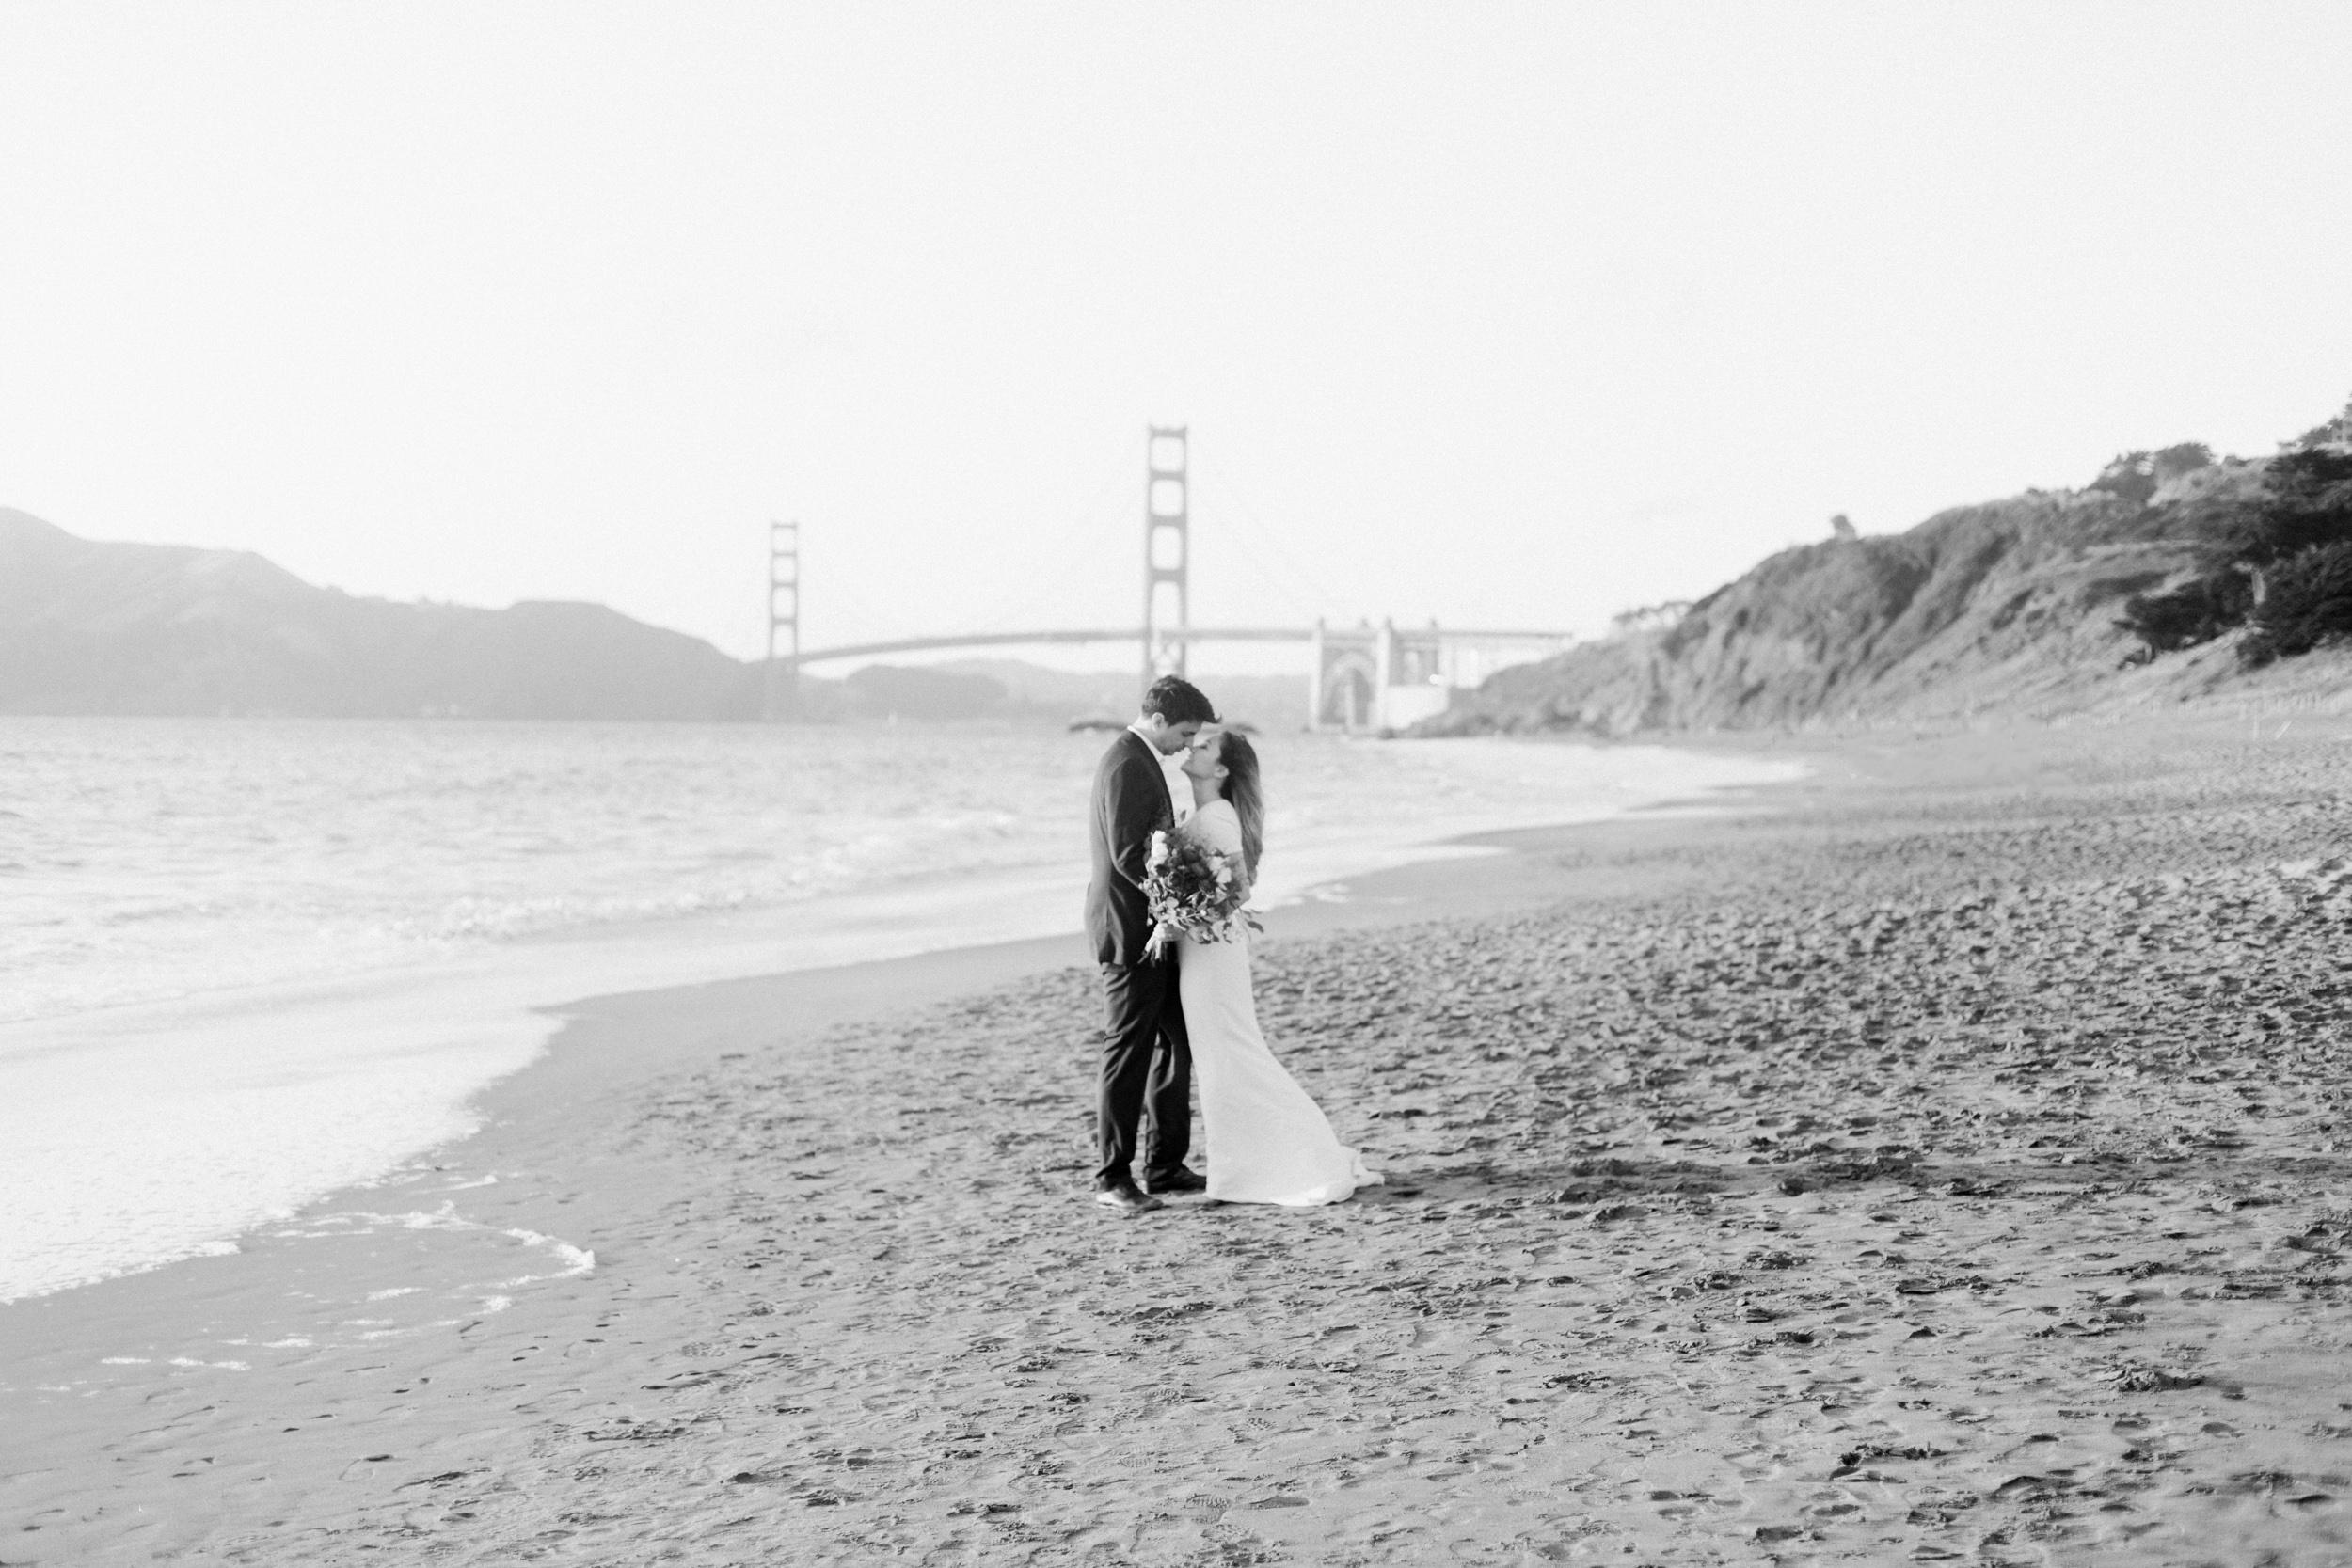 baker-beach-san-francisco-california-engagement-session-carography-stuidos-I58A8372.jpg